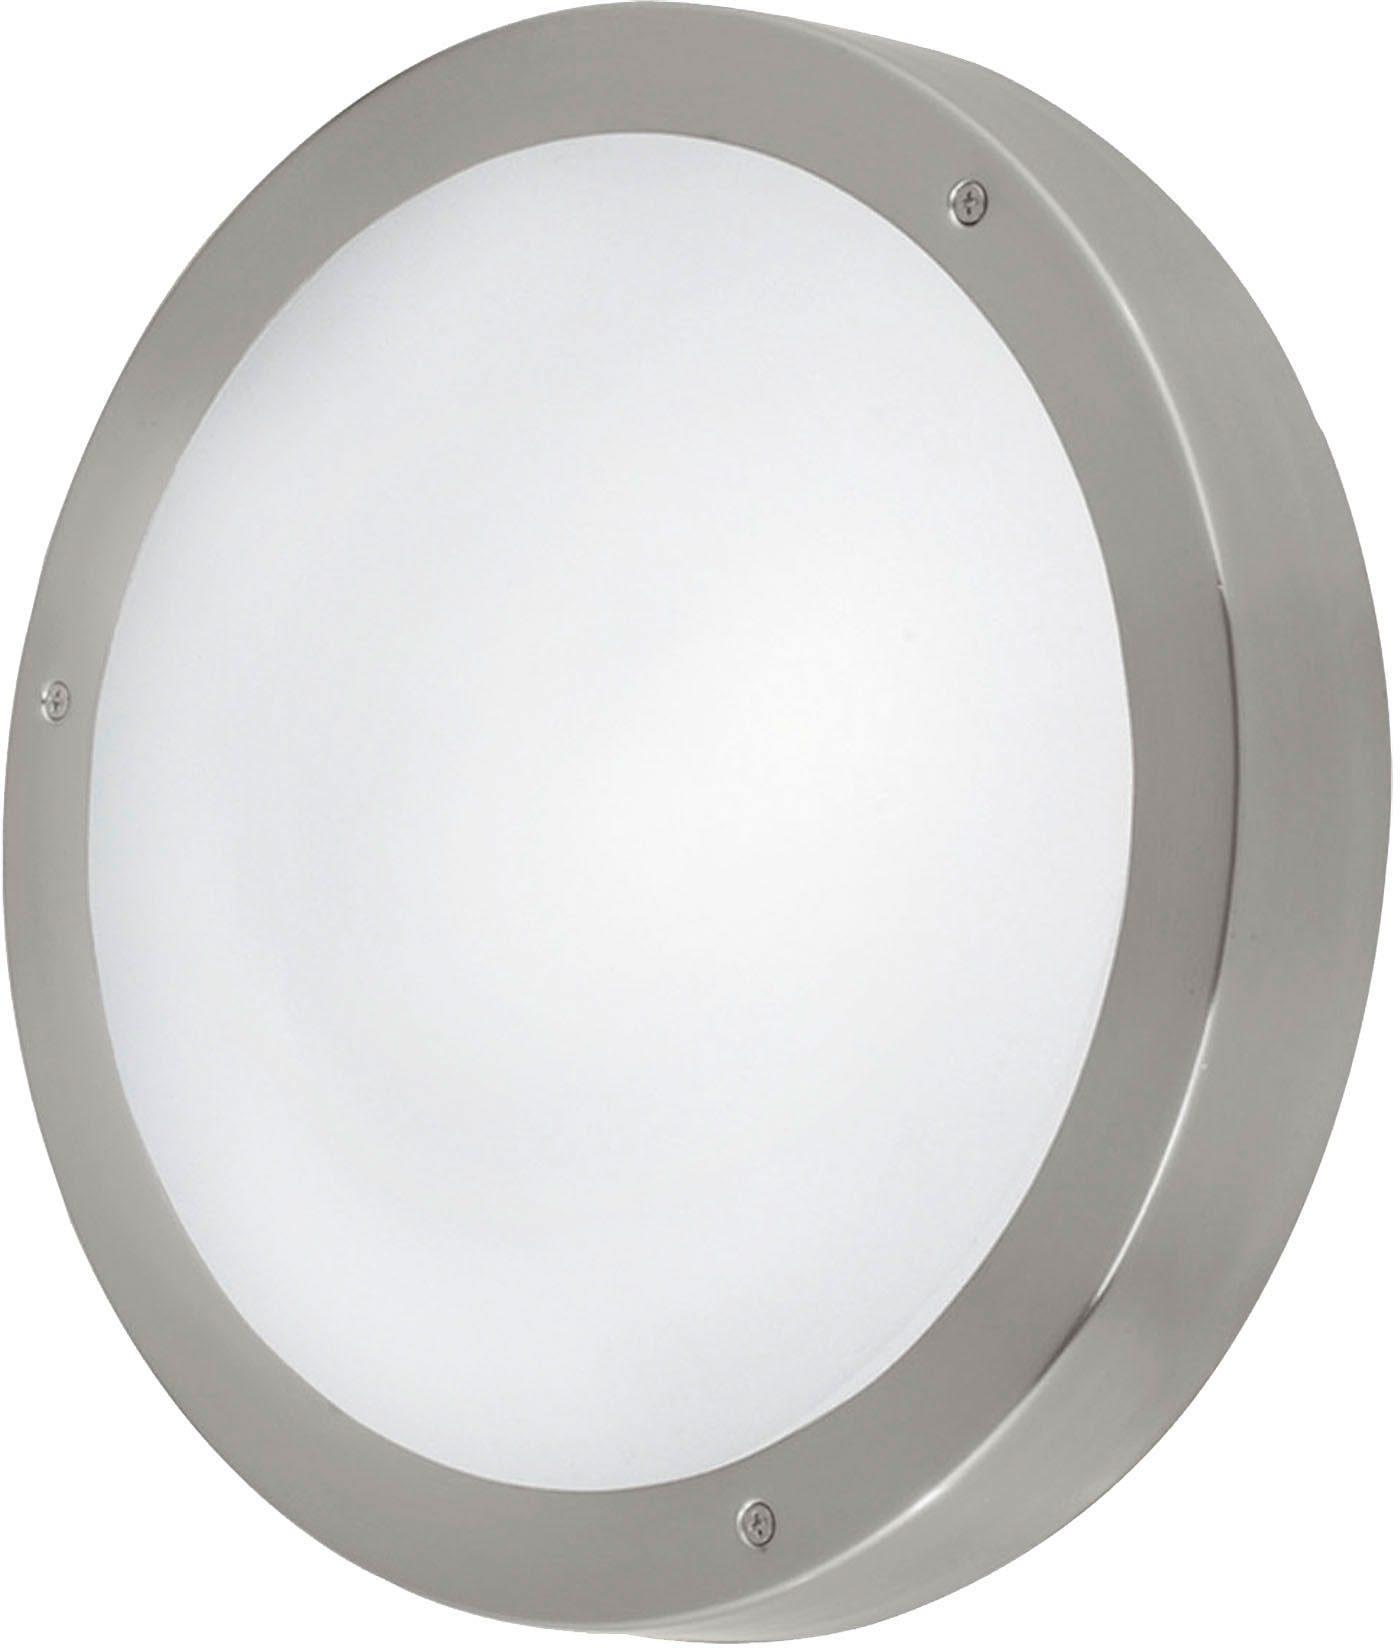 EGLO LED Außen-Wandleuchte »Vento1«, 3-flammig